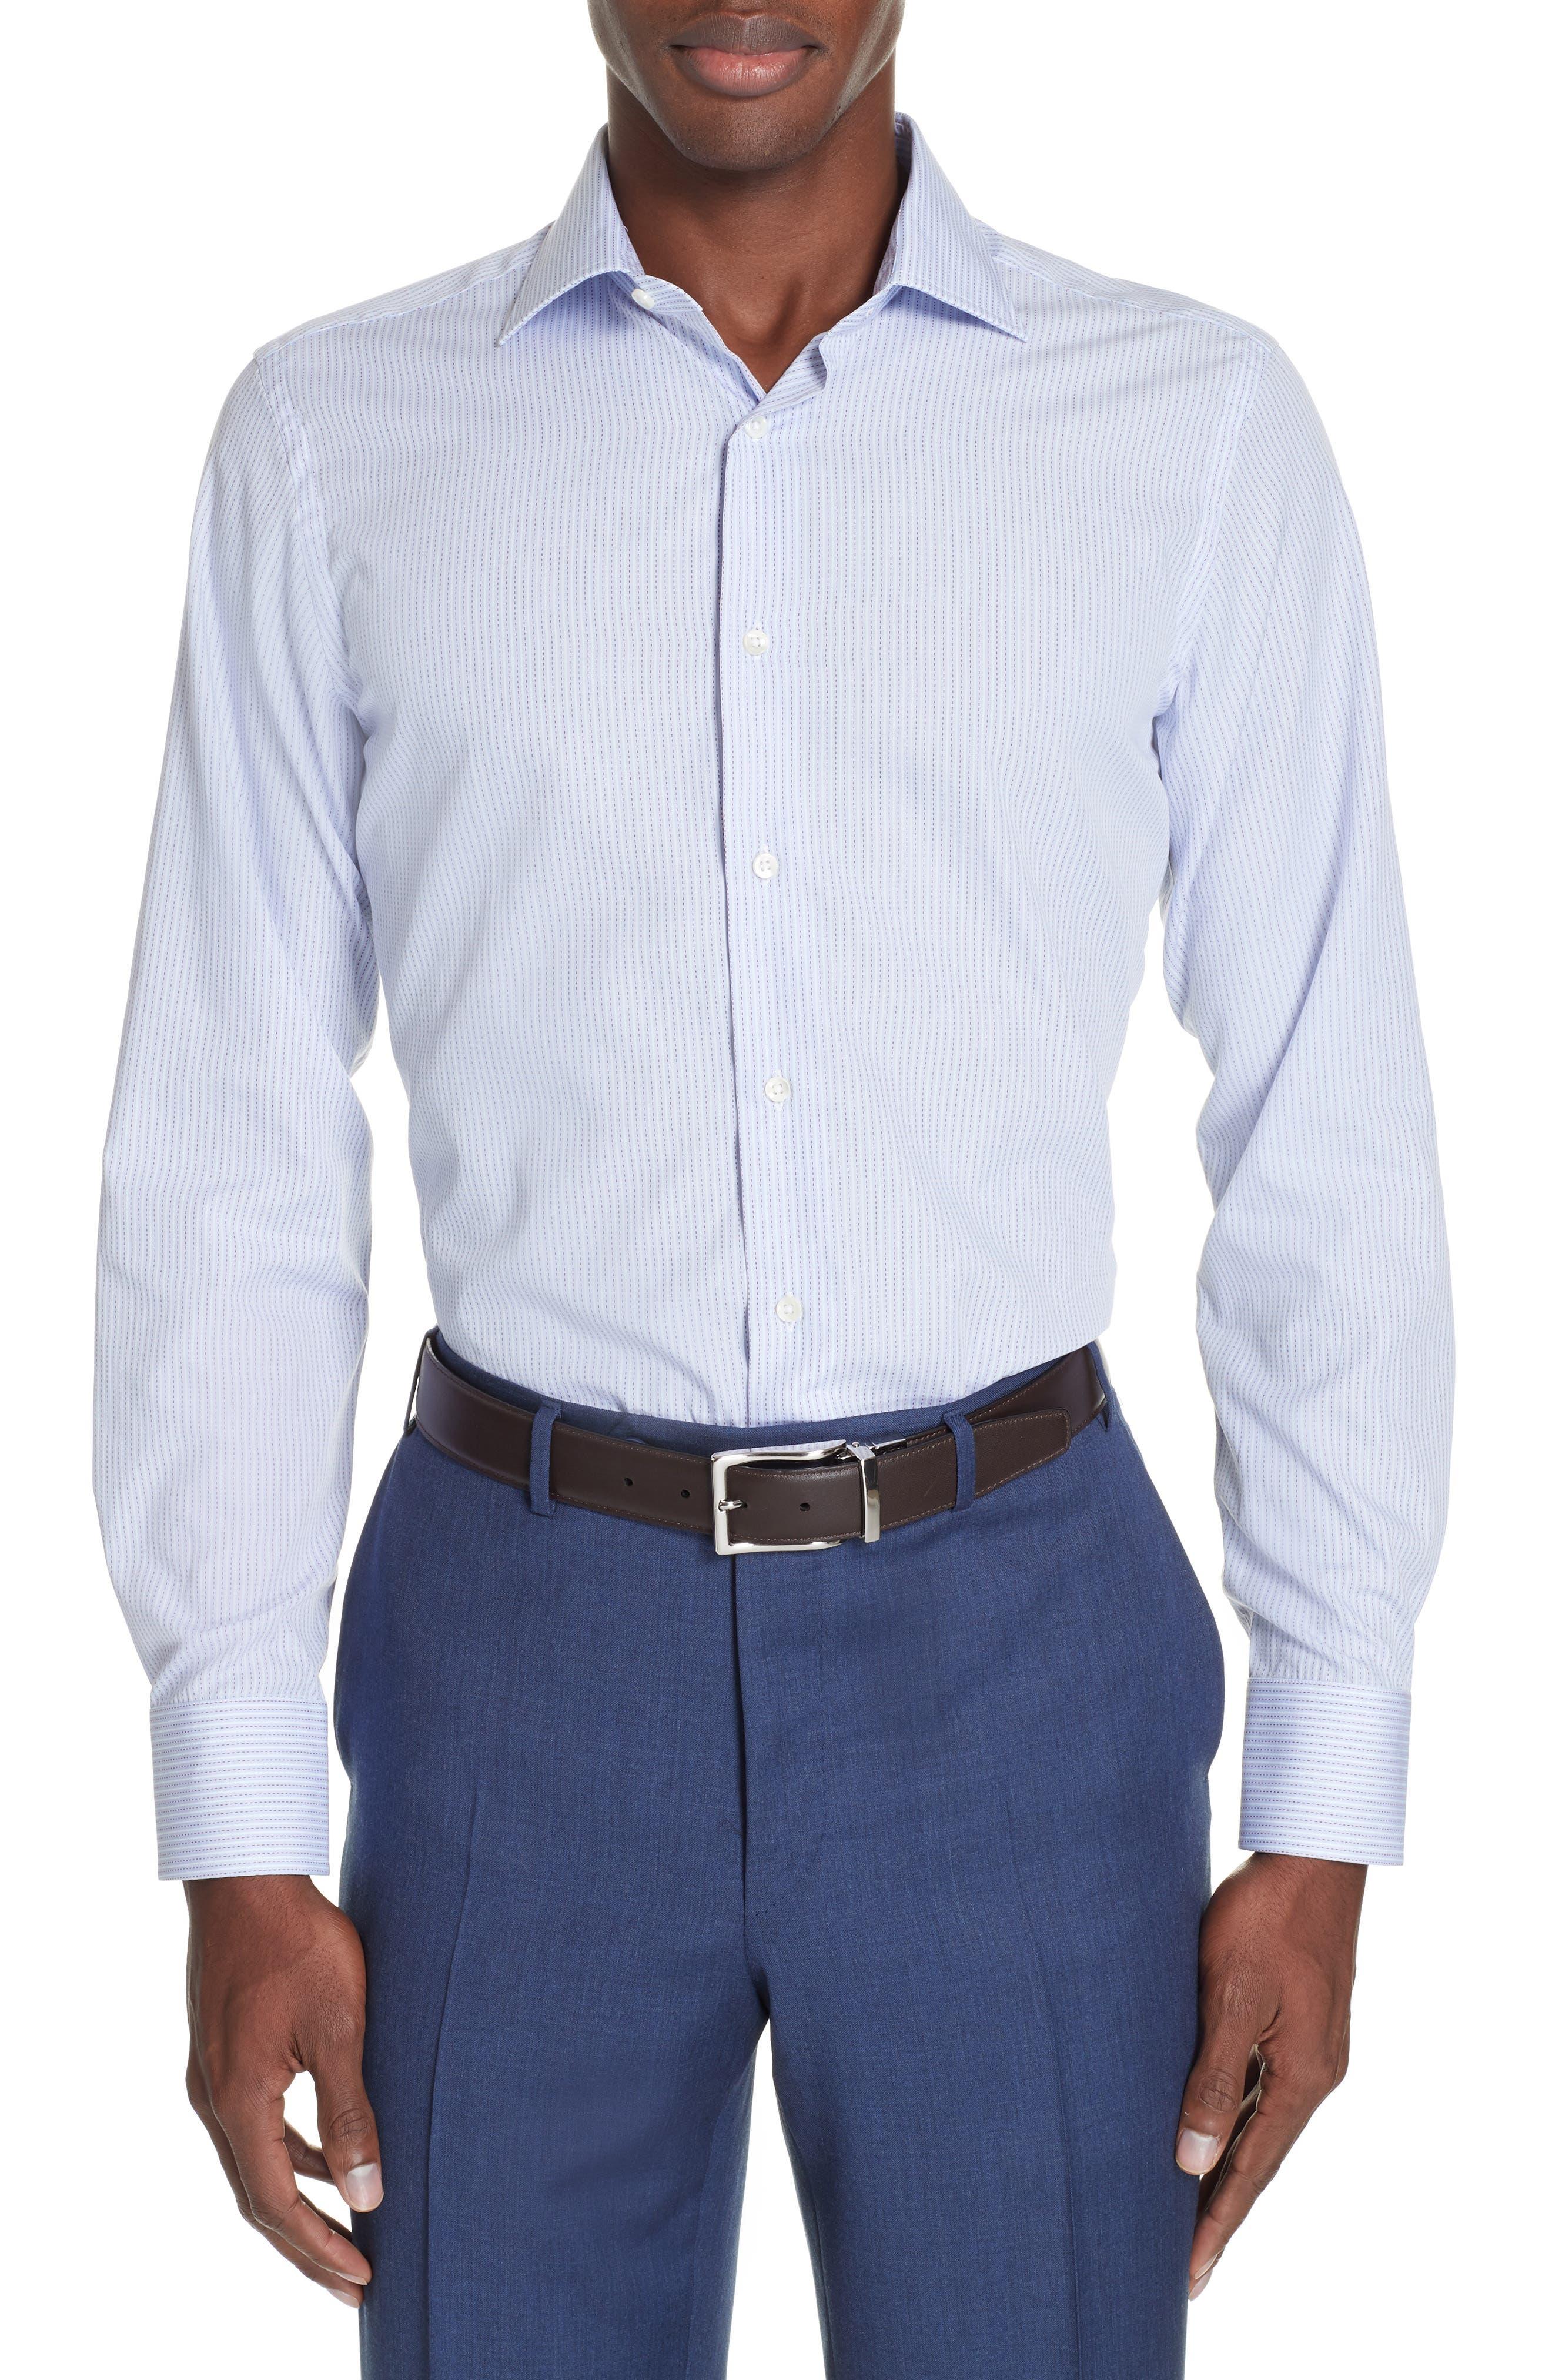 Trim Fit Stripe Dress Shirt,                             Main thumbnail 1, color,                             MED BLUE